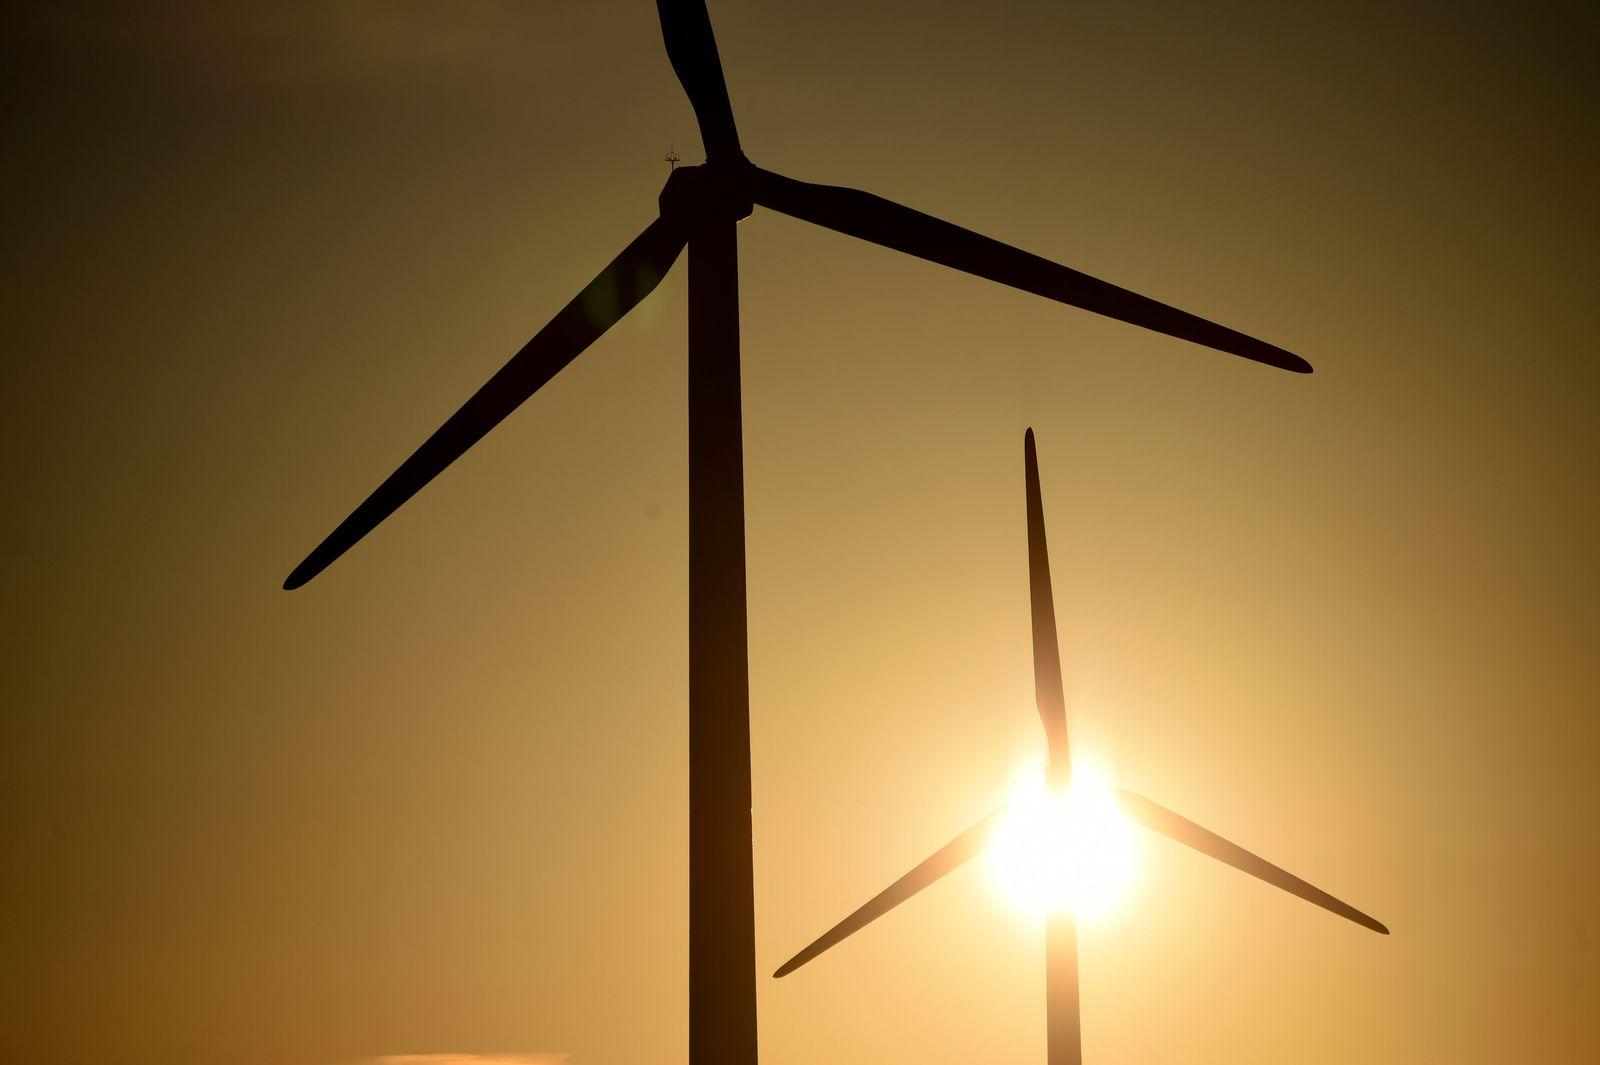 Sonne hinter Windrädern